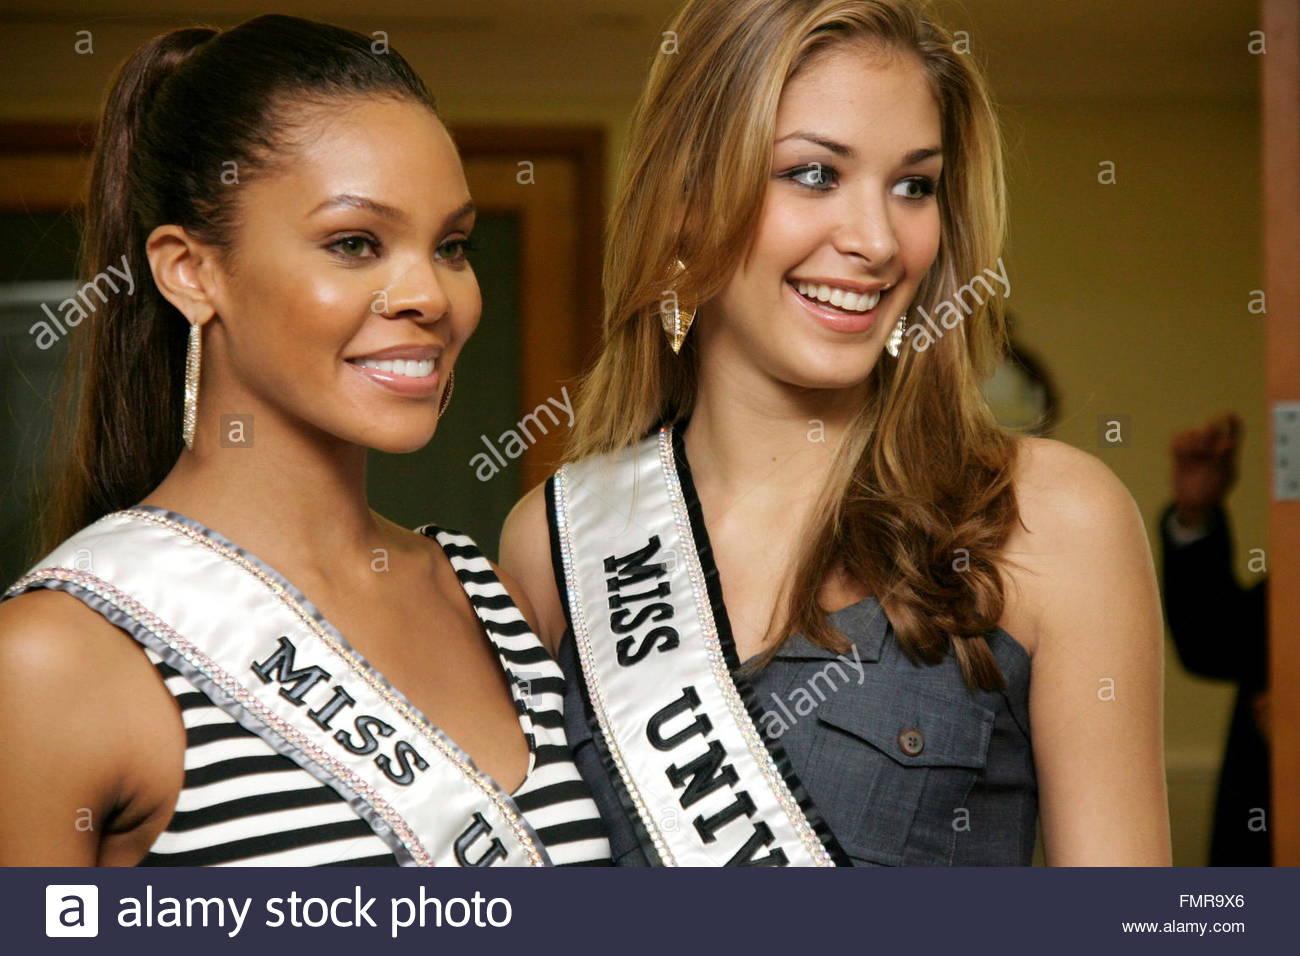 dayana mendoza, miss universe 2008. - Página 36 Miss-universe-2008-venezuelan-dayana-mendoza-r-smiles-next-to-miss-FMR9X6_xmg0